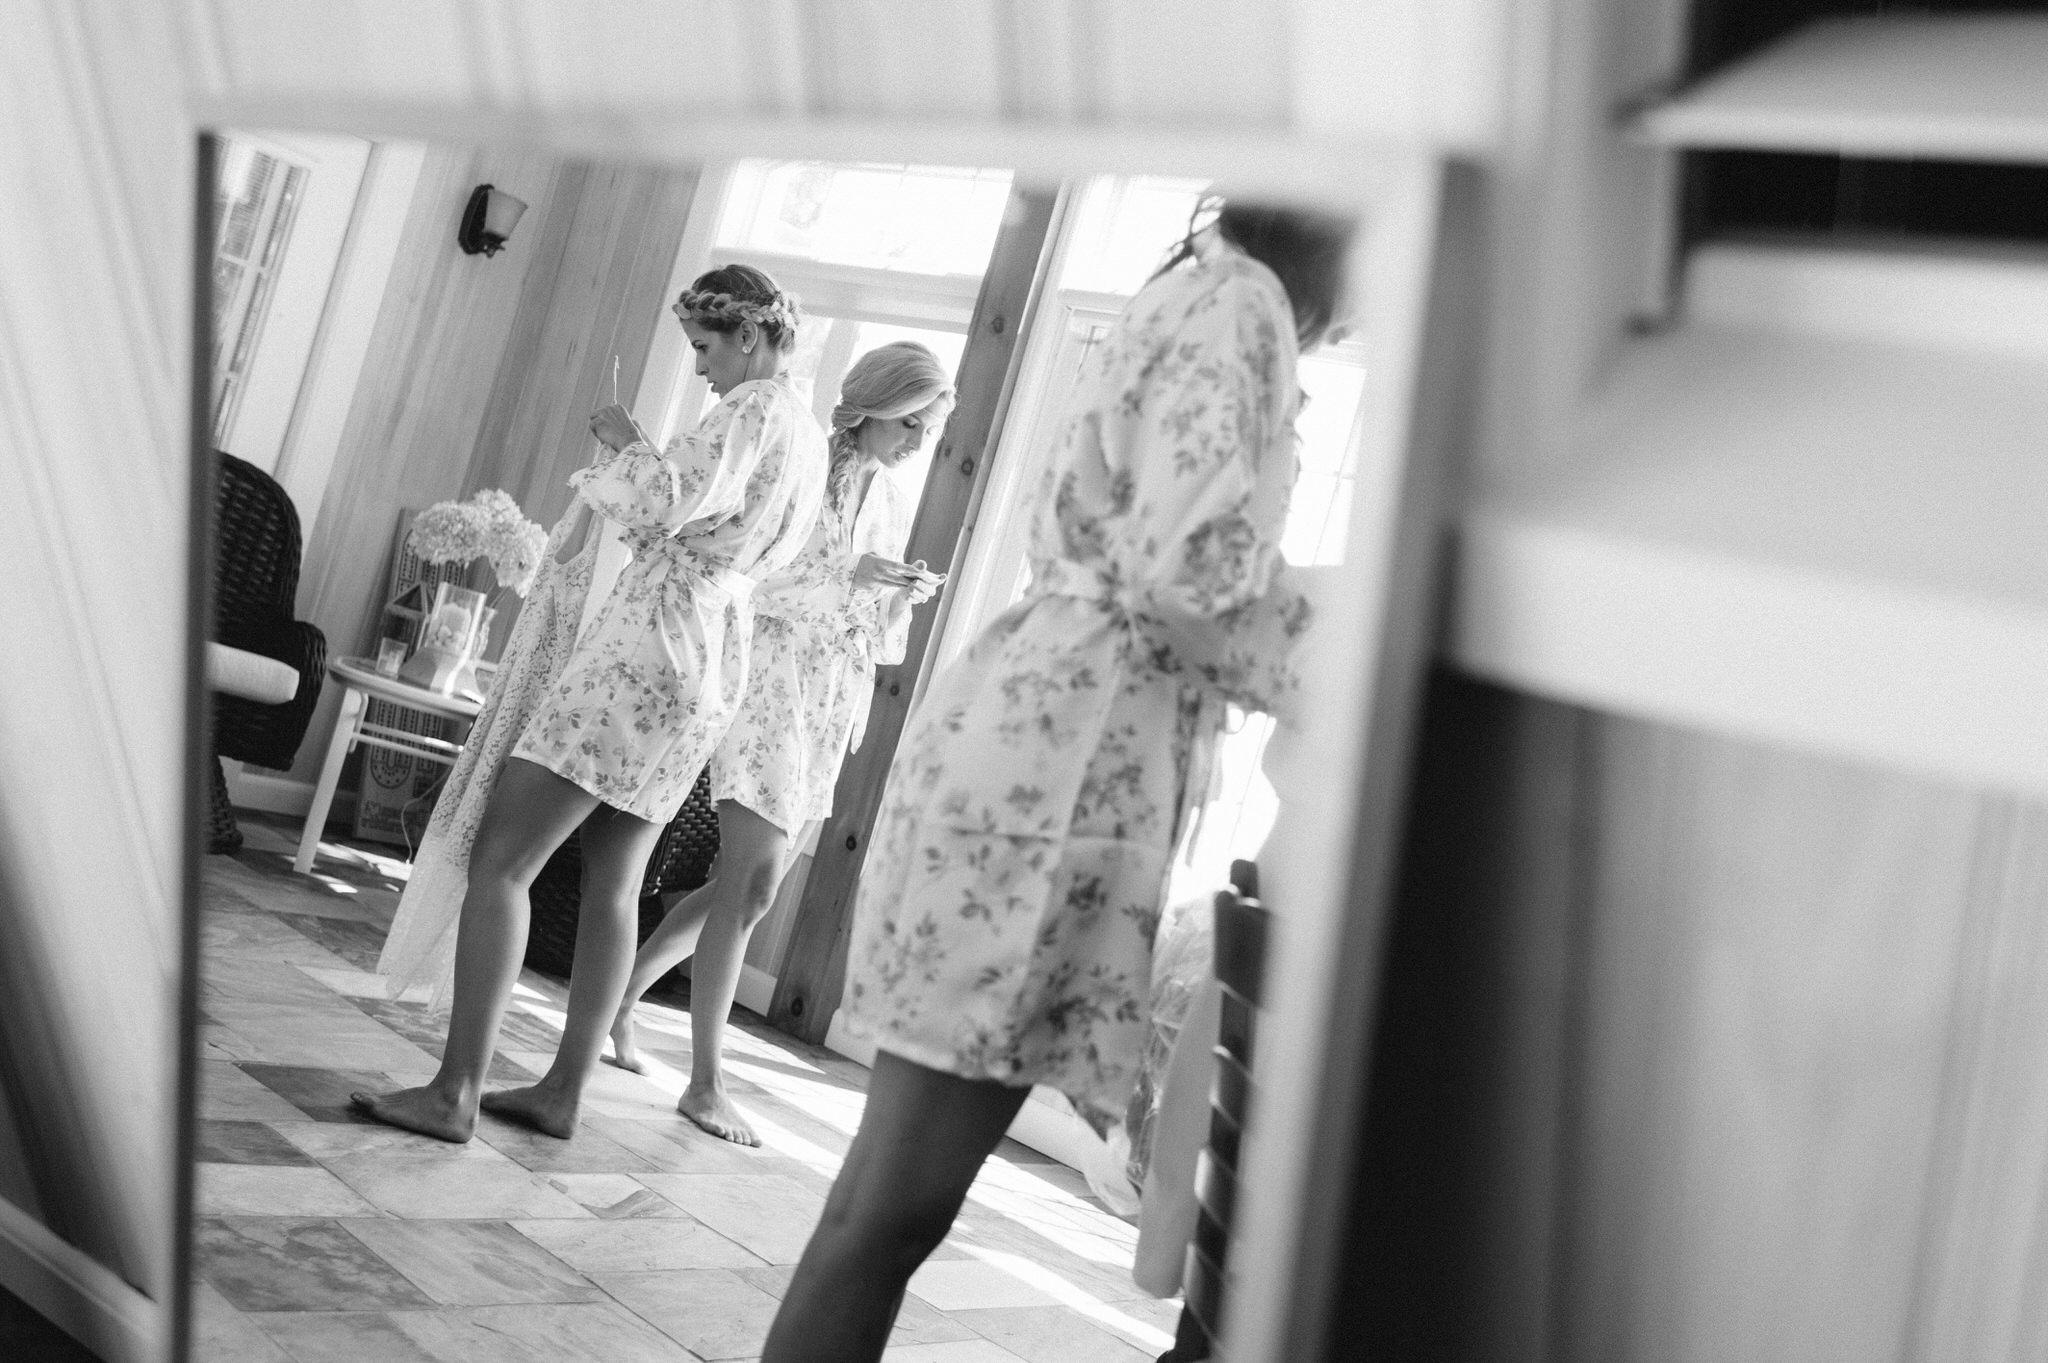 toronto wedding photography scarlet oneill025.JPG